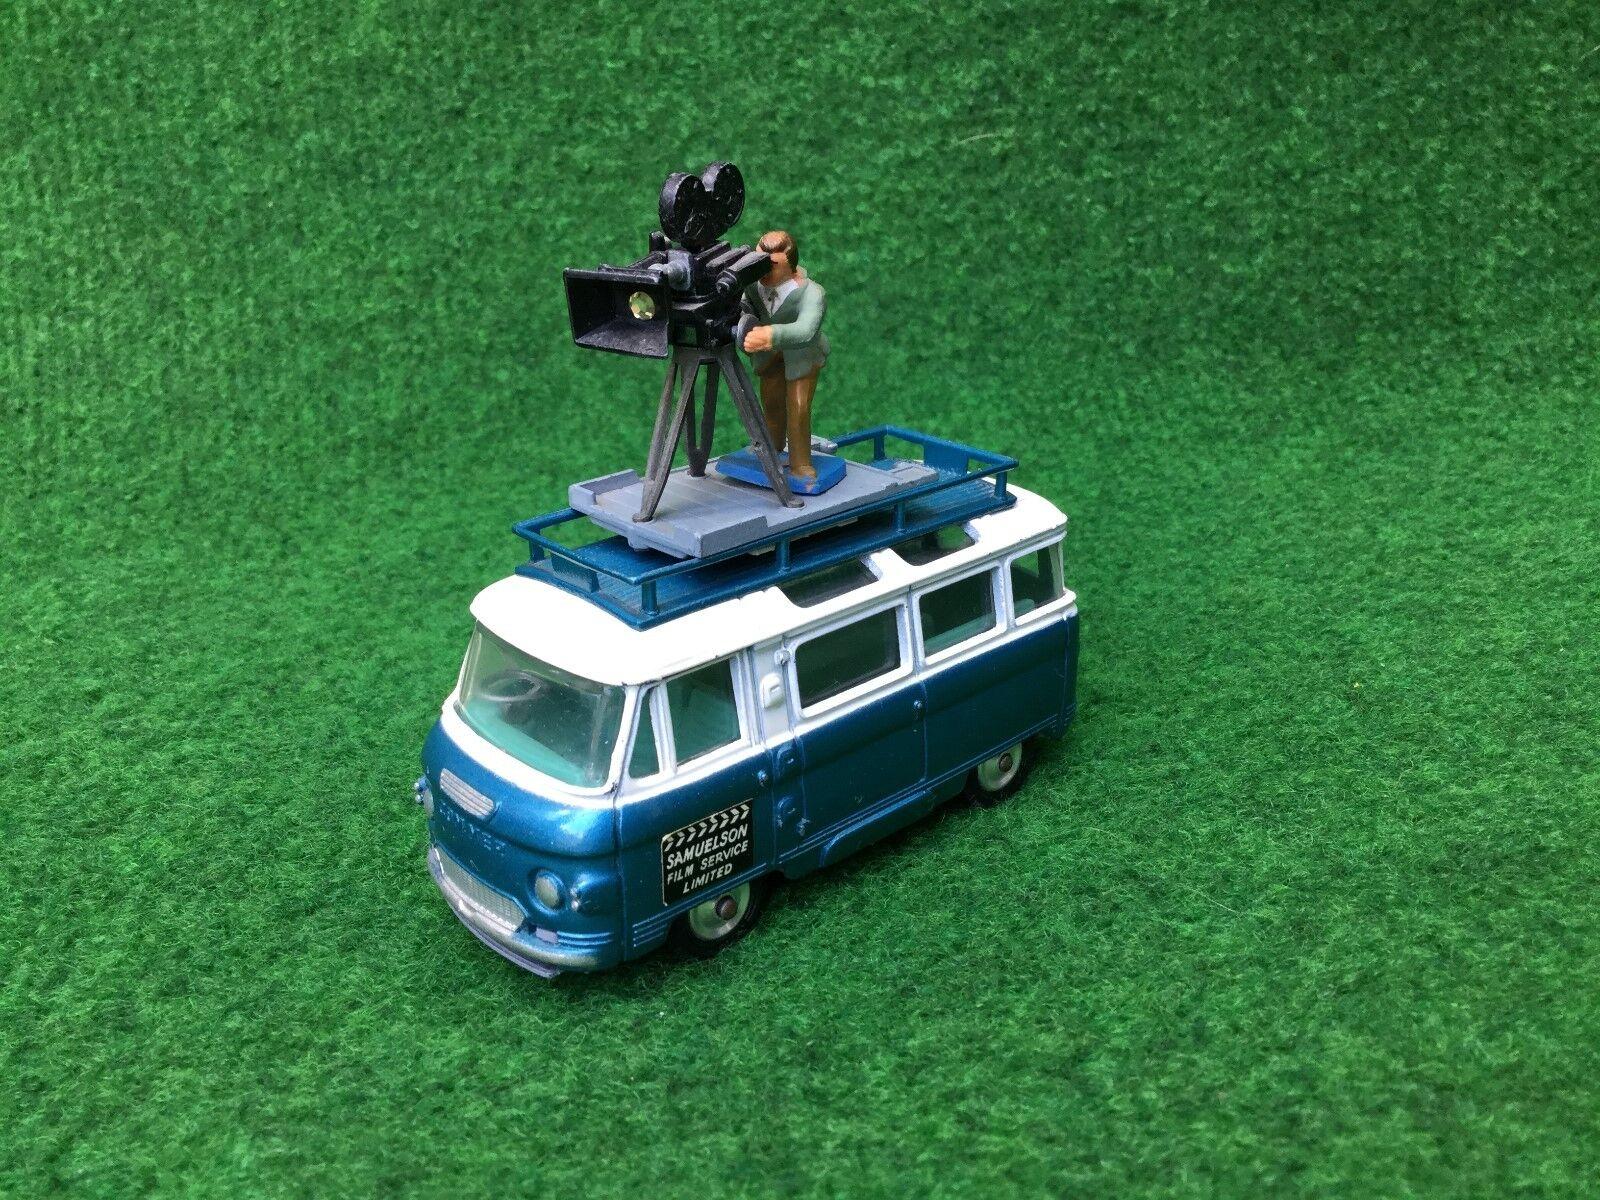 Corgi spielzeug nr. 479 durch mobile kamera van